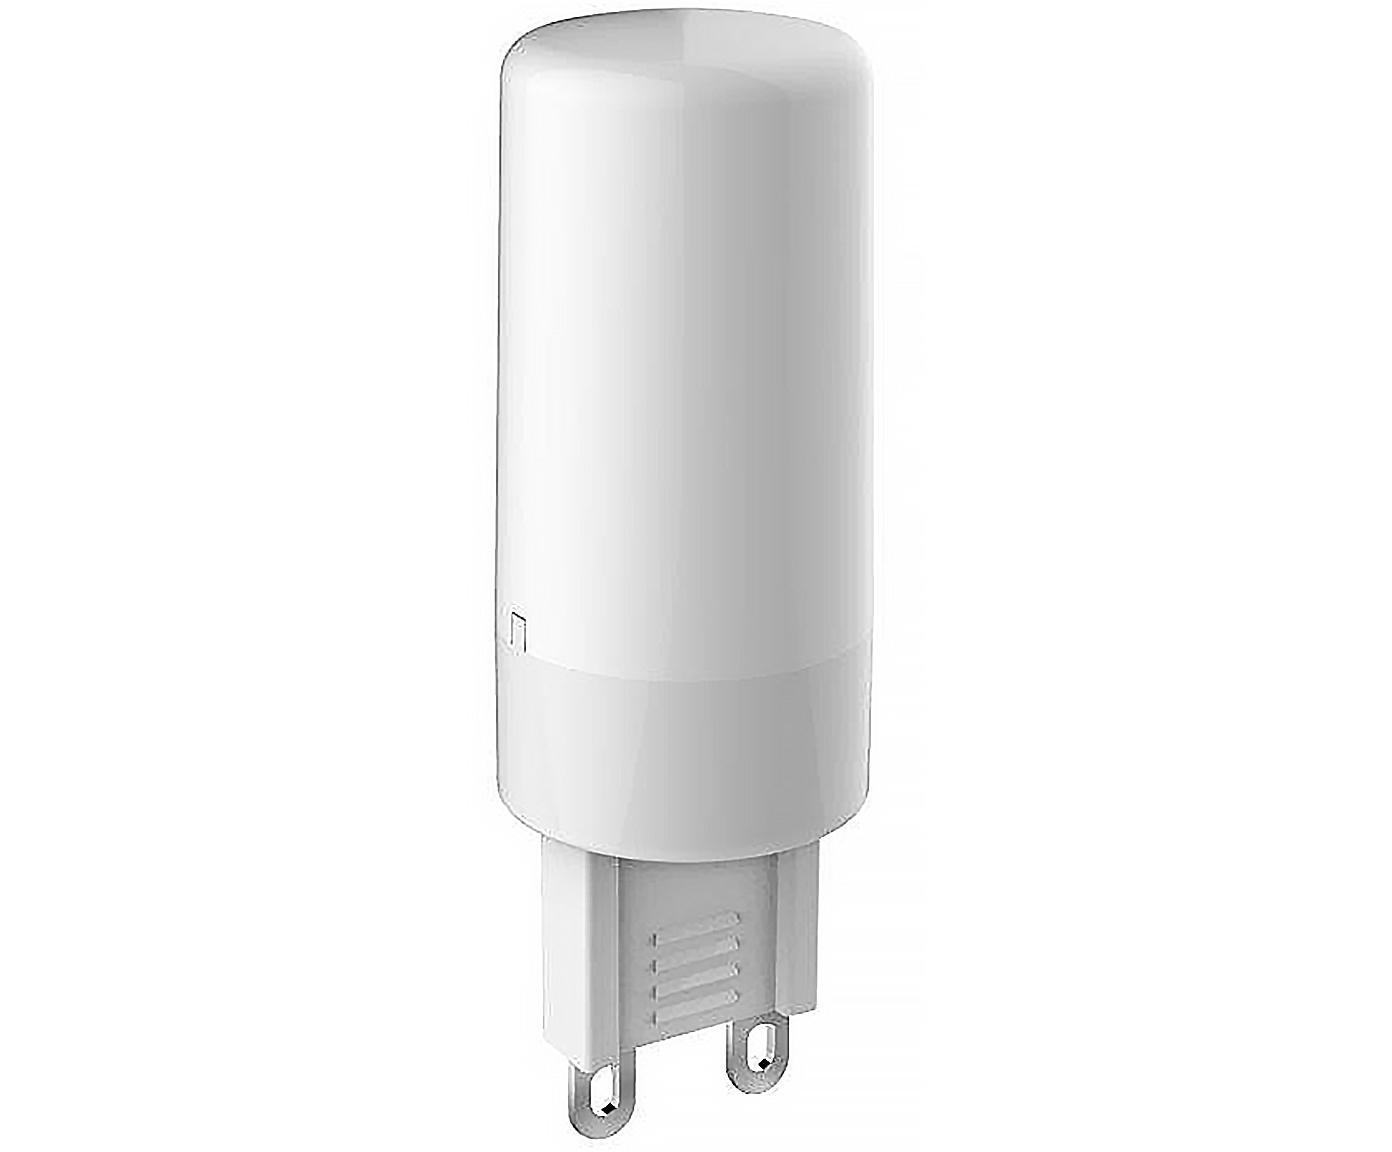 Bombillas LED Gabriel (G9/3,3W),5uds., Ampolla: plástico, Casquillo: aluminio, Transparente, Ø 2 x Al 6 cm